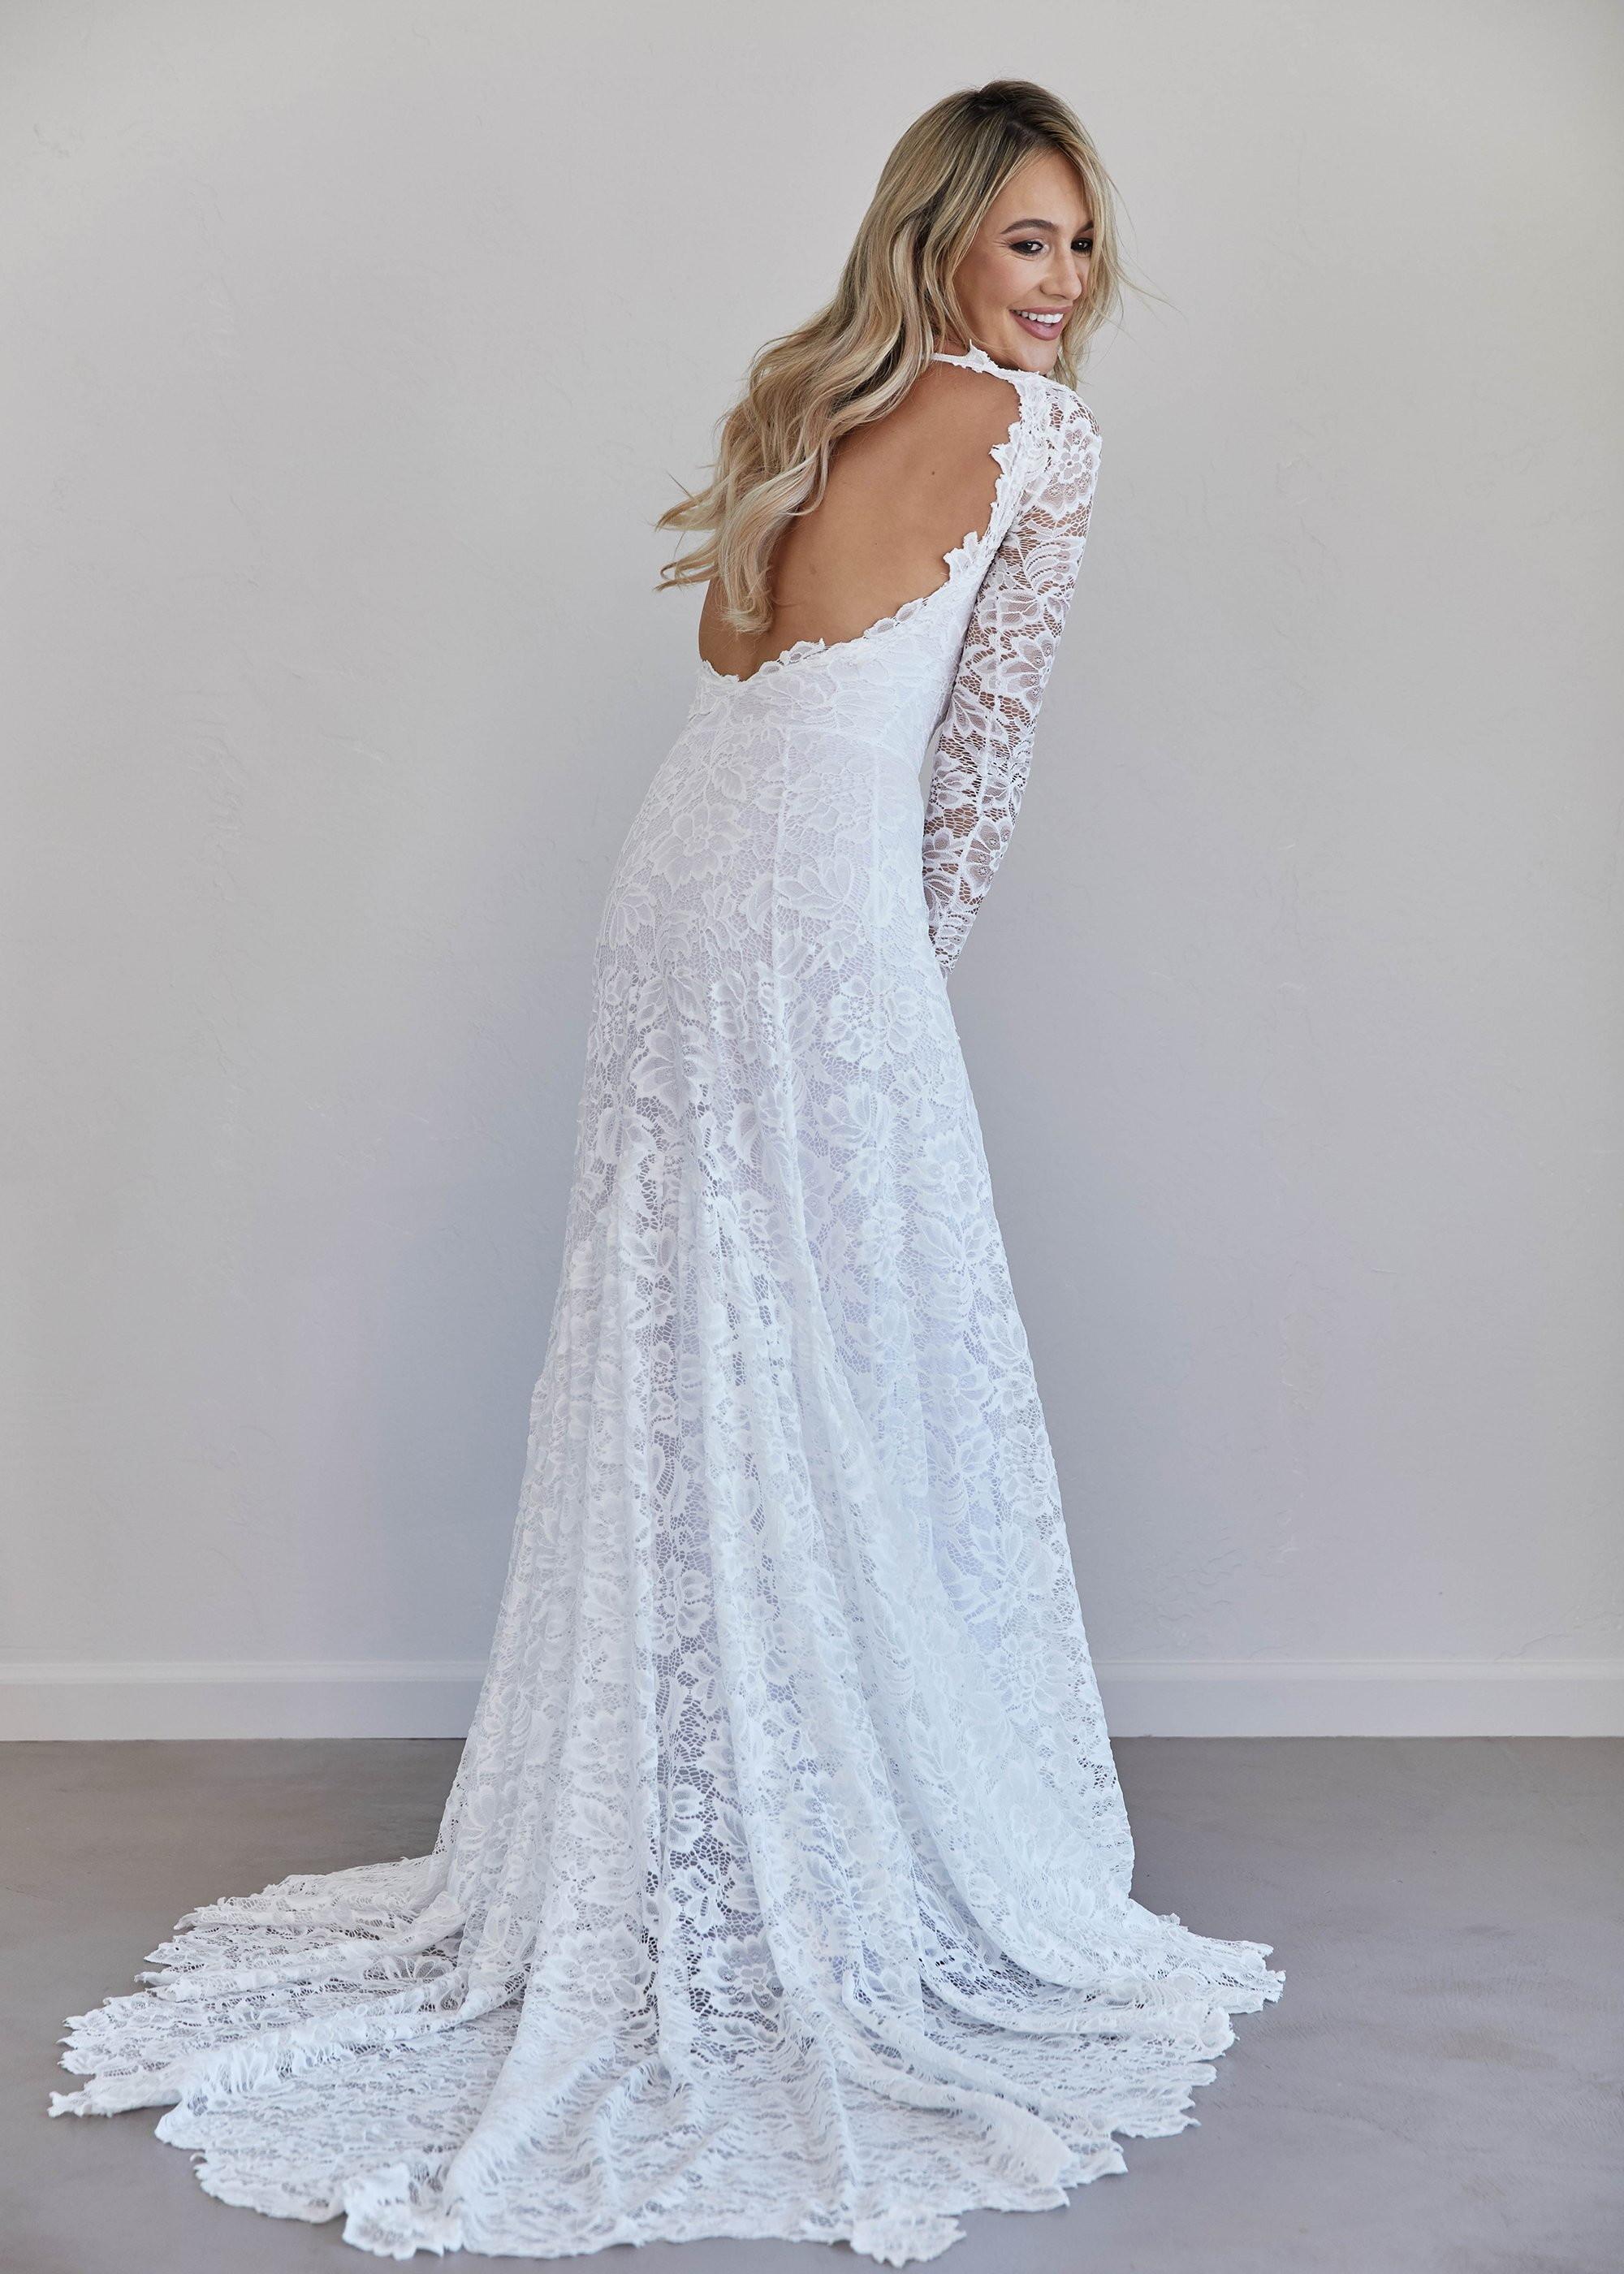 Vestido De Noiva Simples E Elegante Elo7